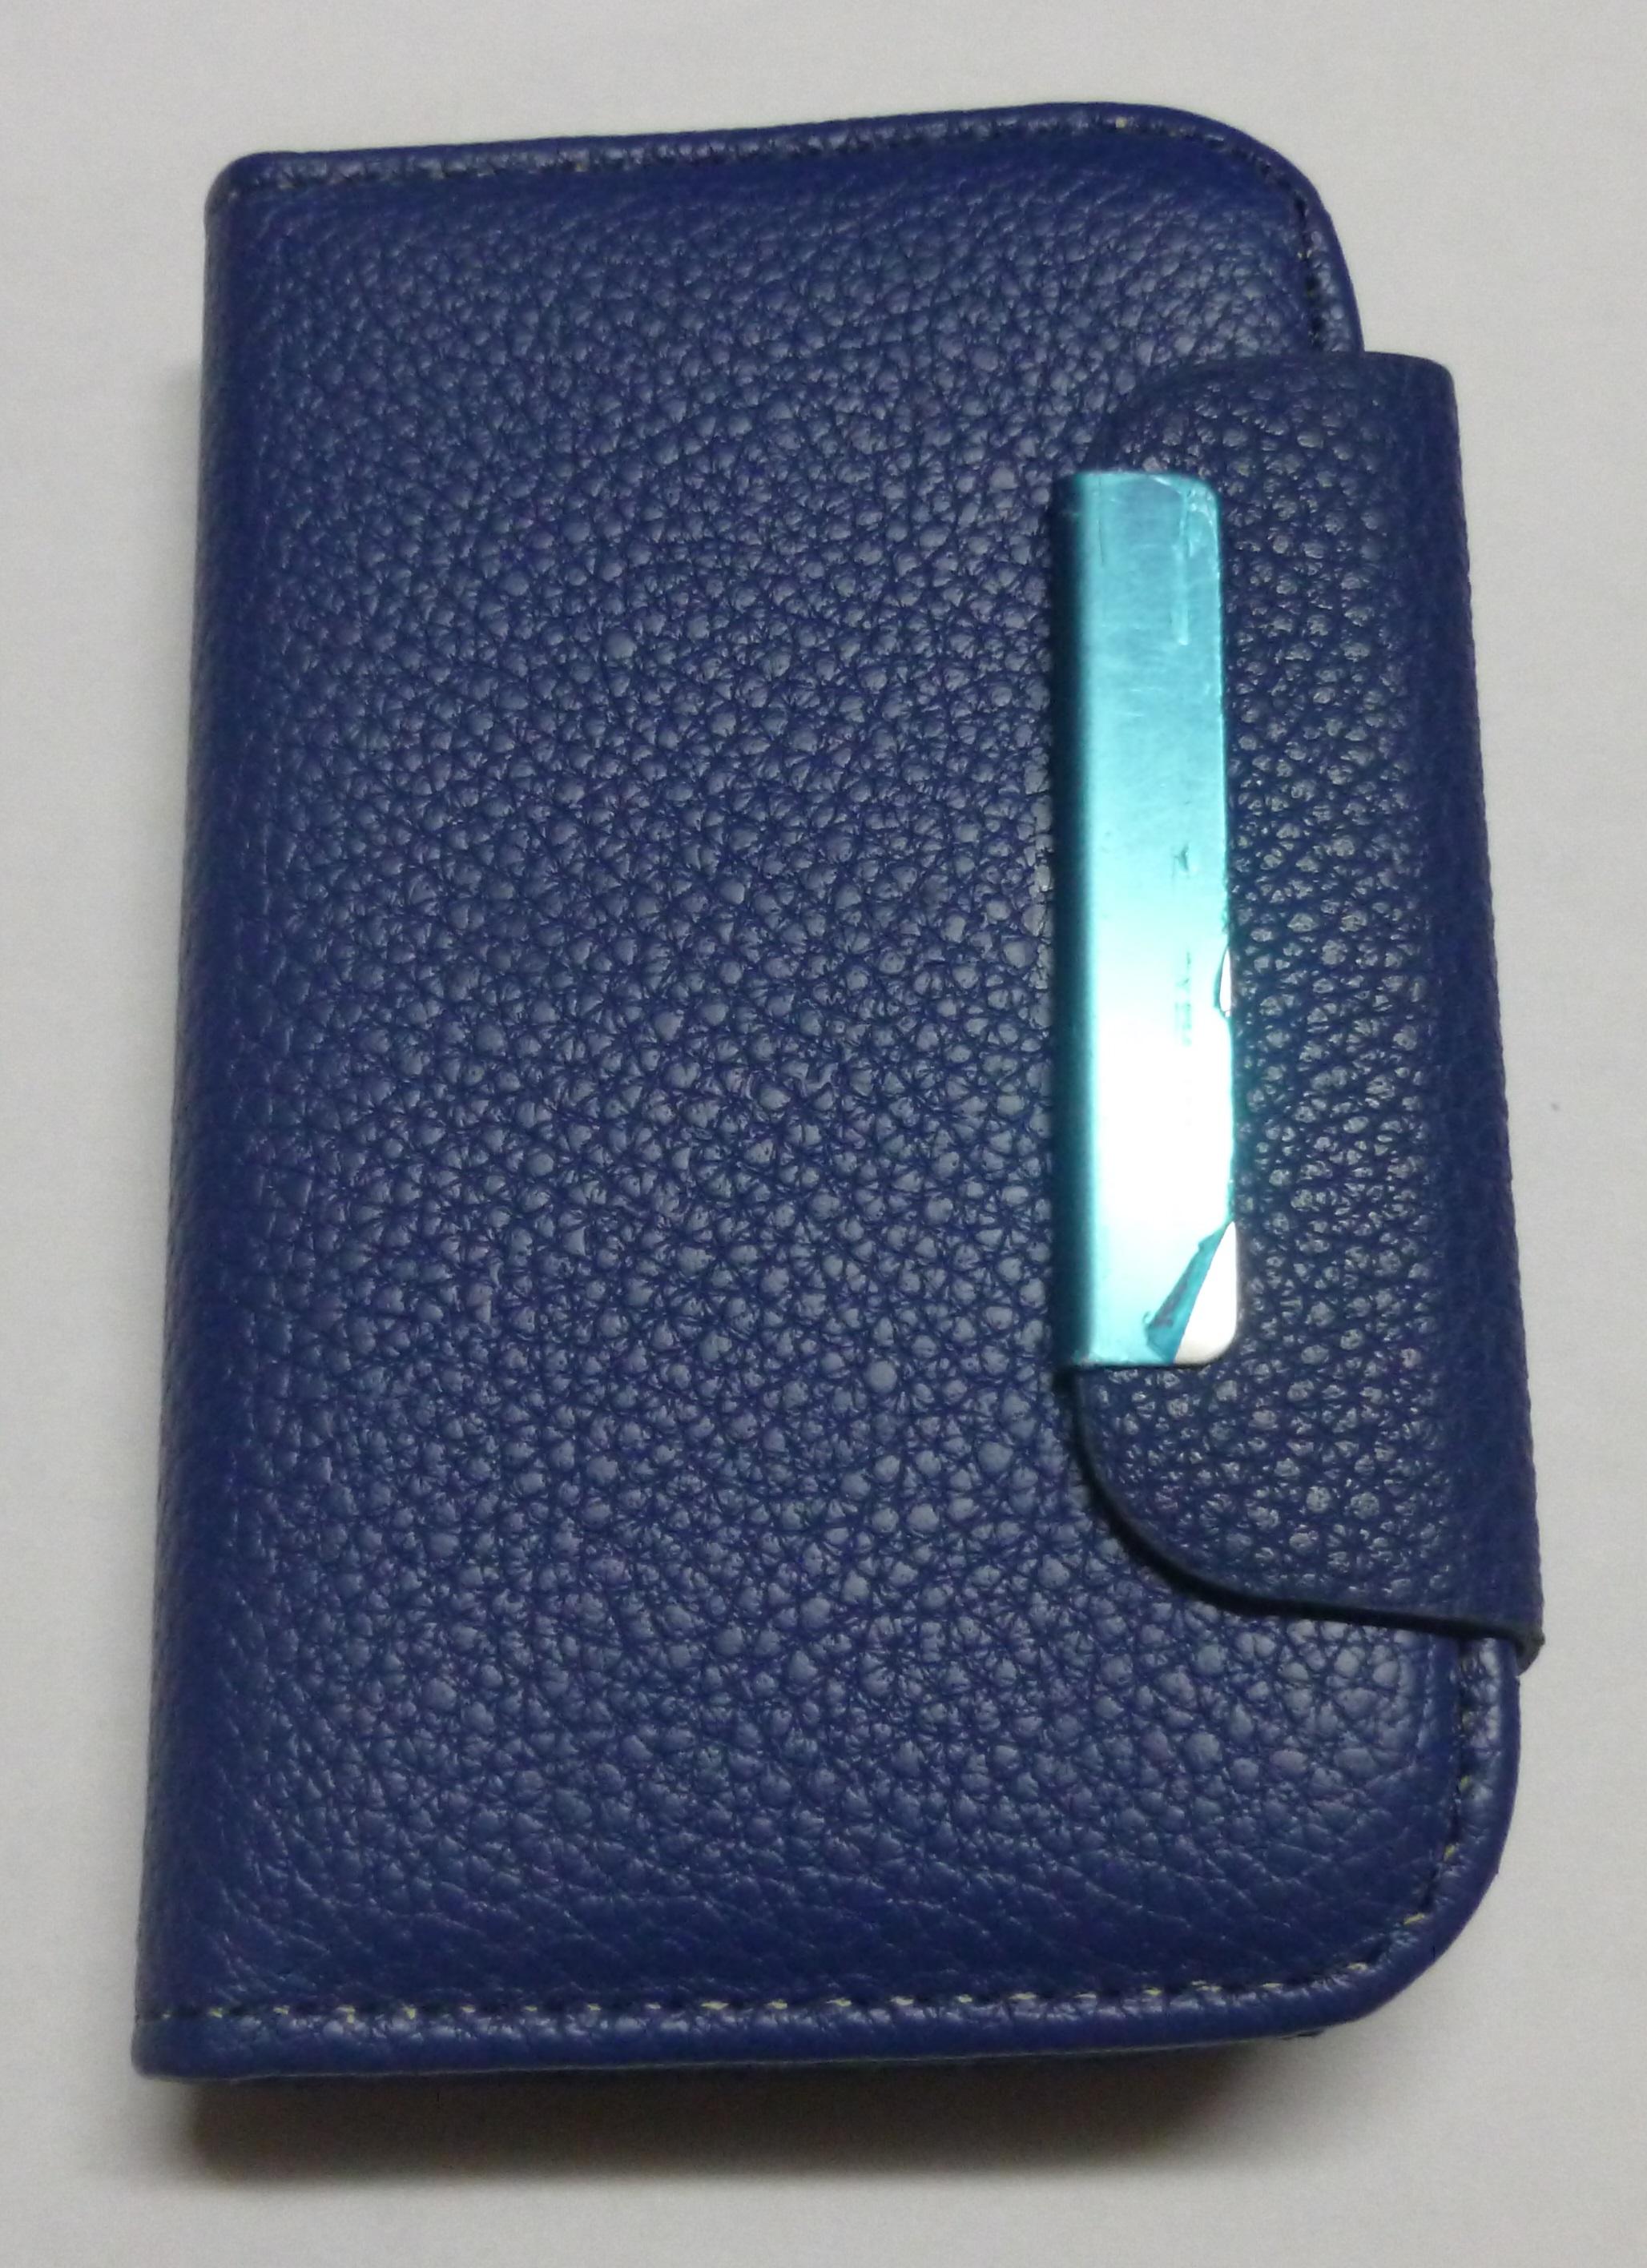 Lg Optimus L1 Ii E410 Leather Wallet Case Blue Oem In Category Black